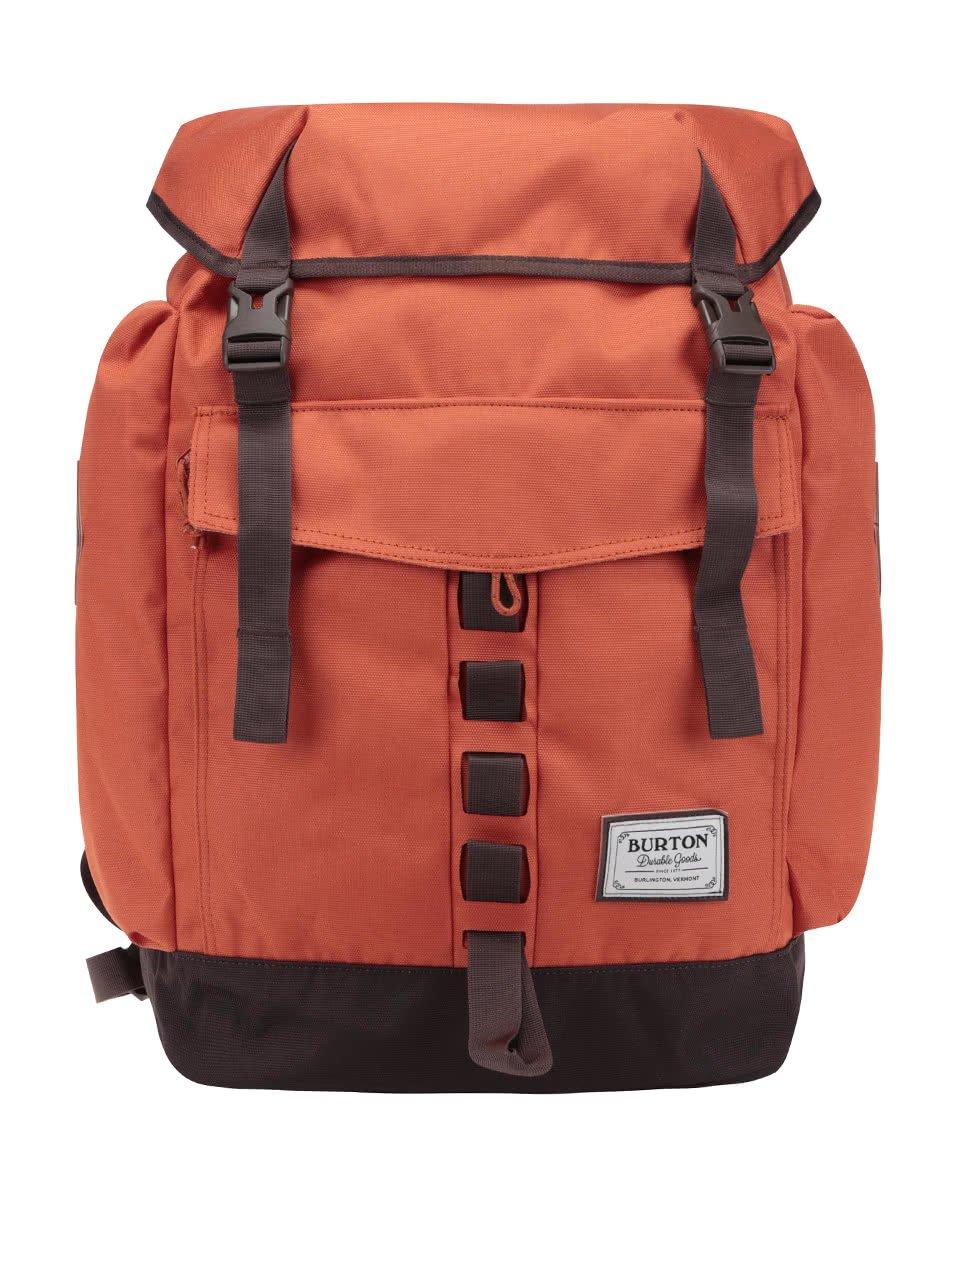 Oranžový unisex batoh Burton Fanthom Pack